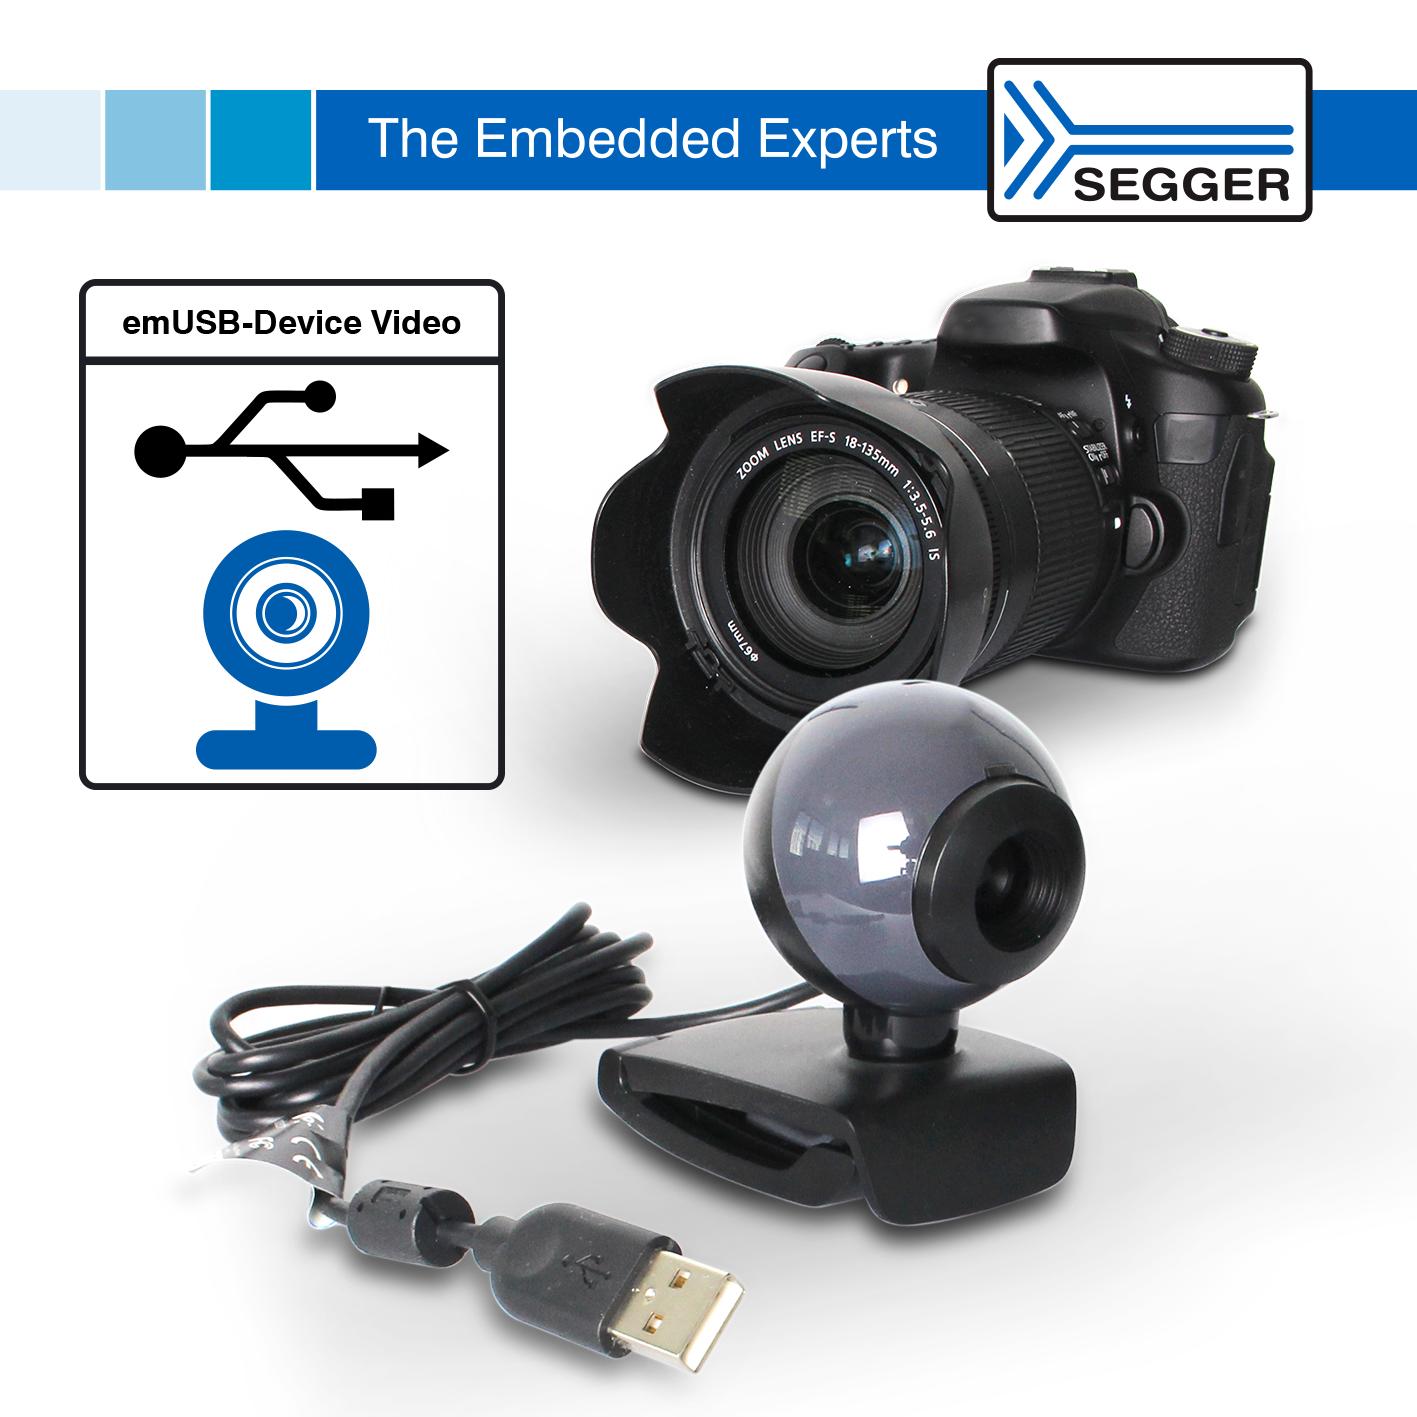 emUSB-Device Video – Easily transmit video via USB